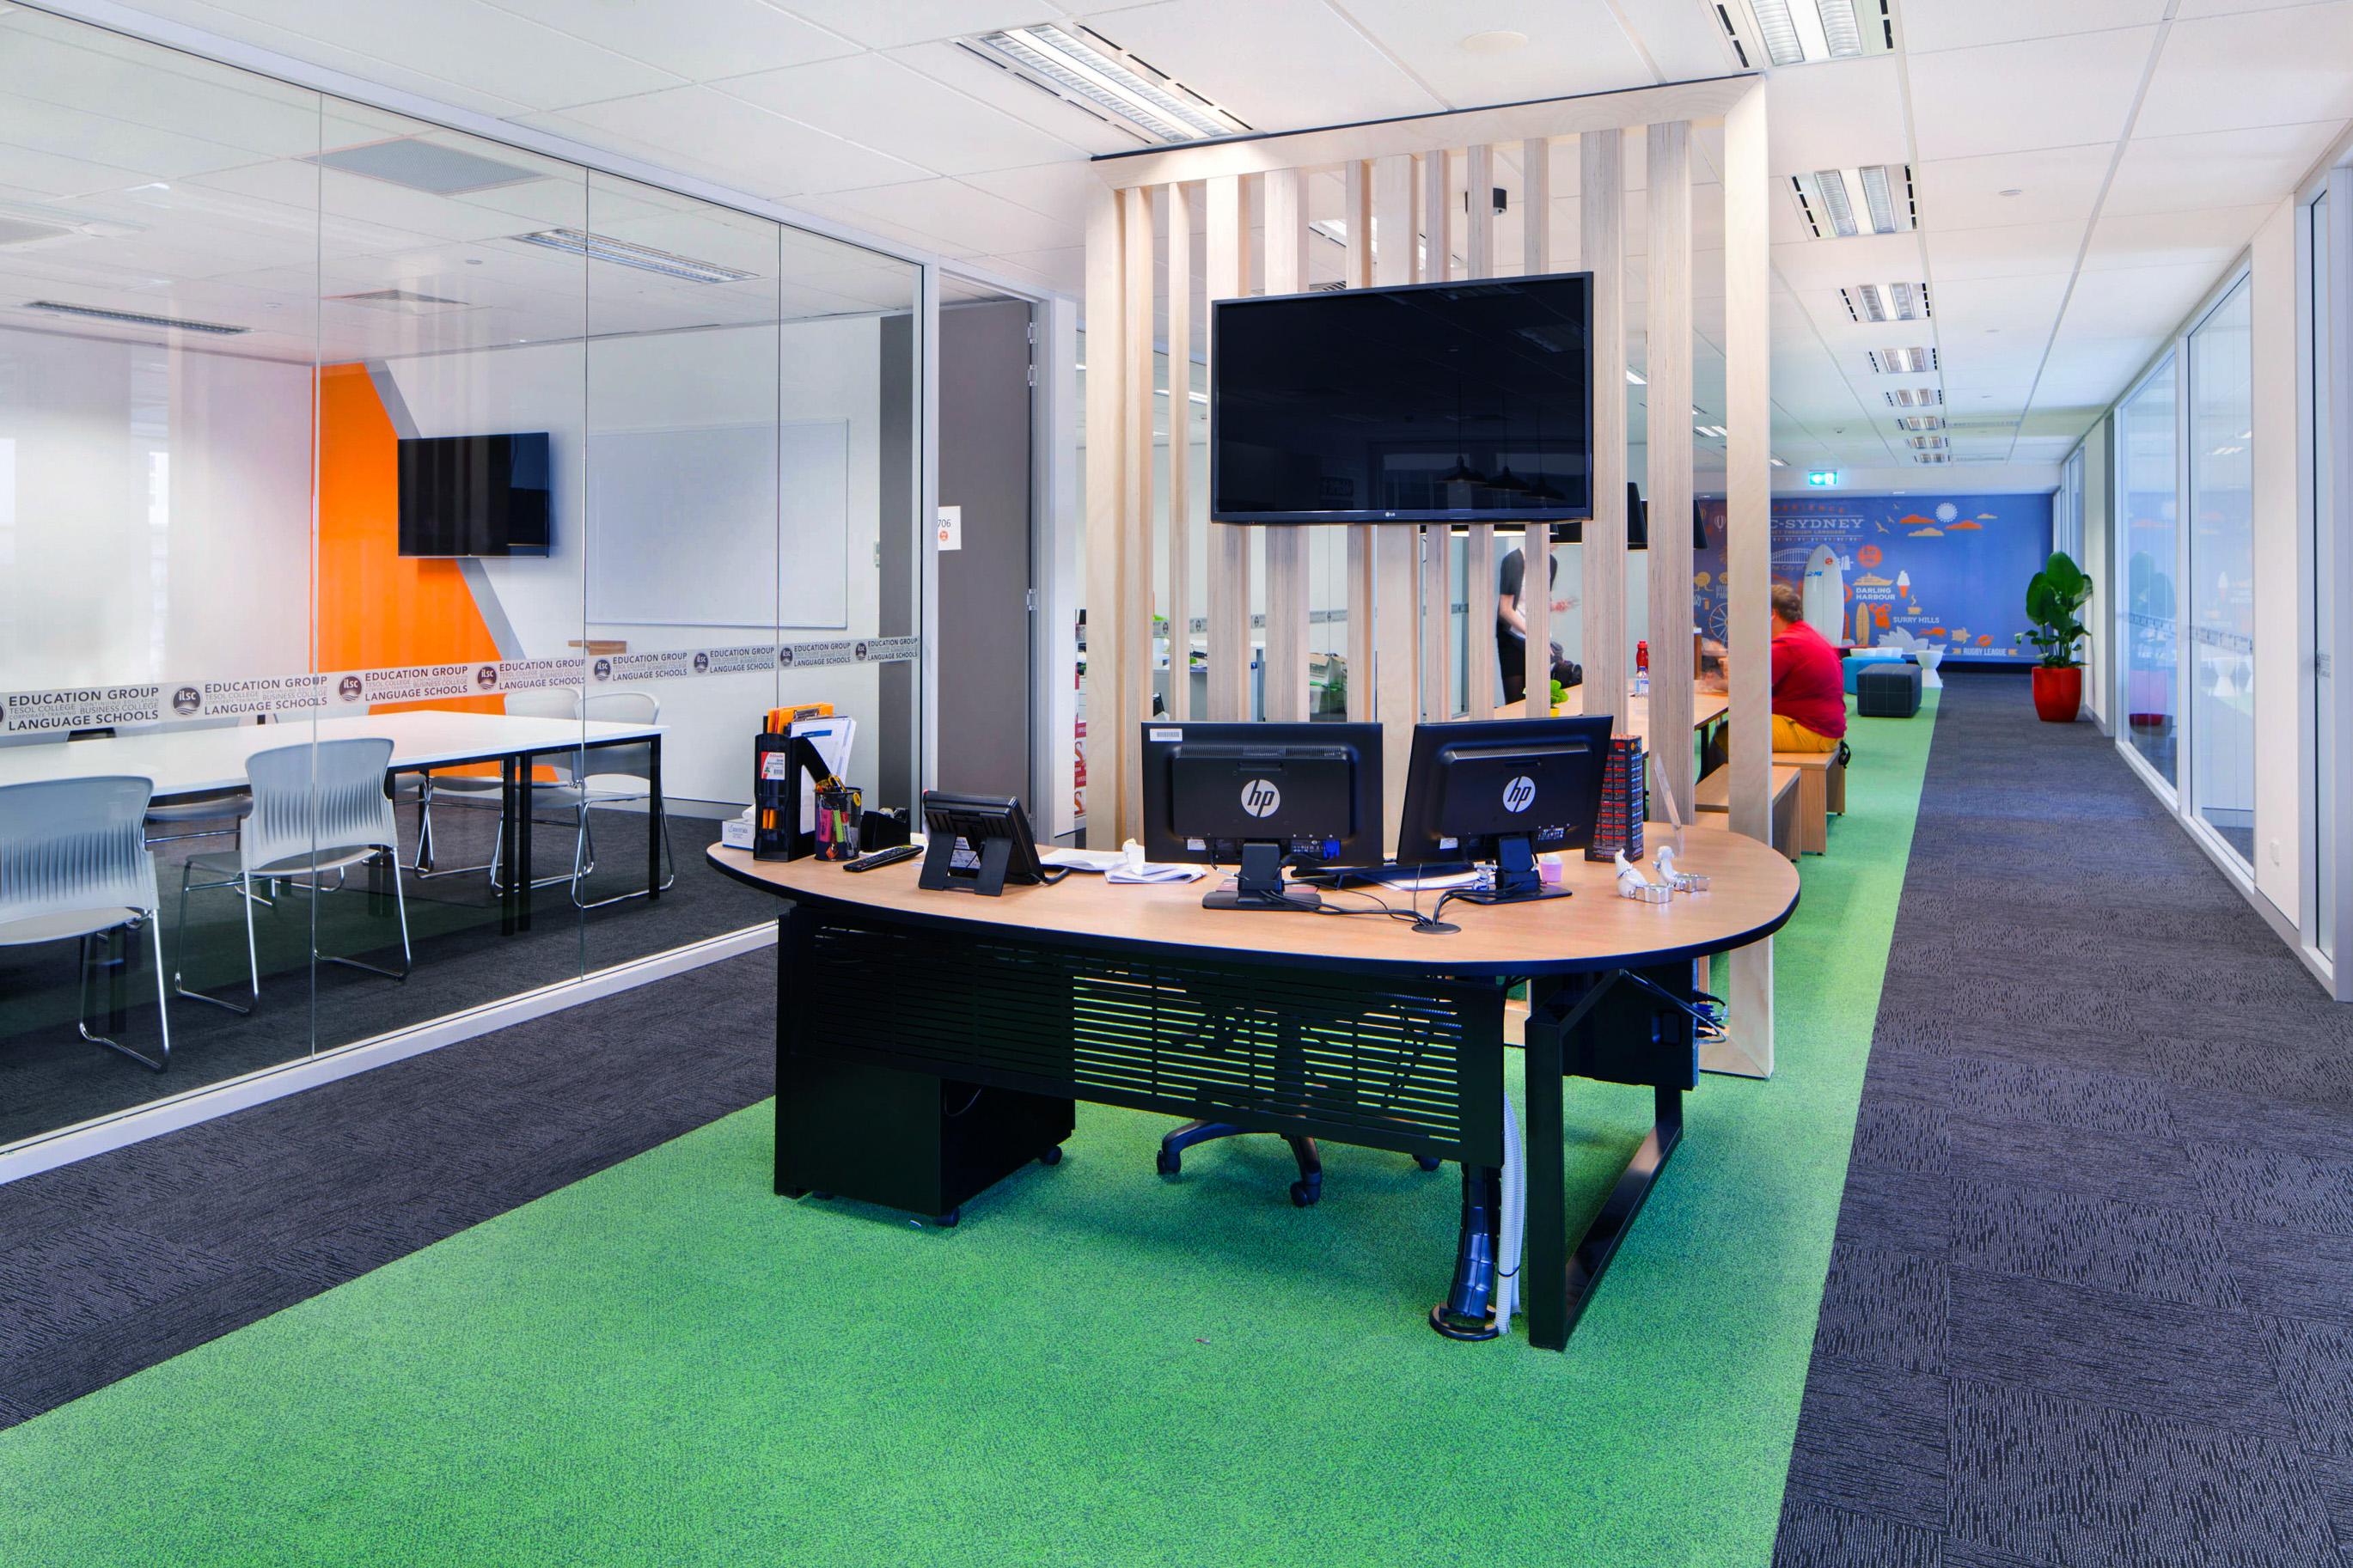 ilsc-sydney-campus-activity-desk